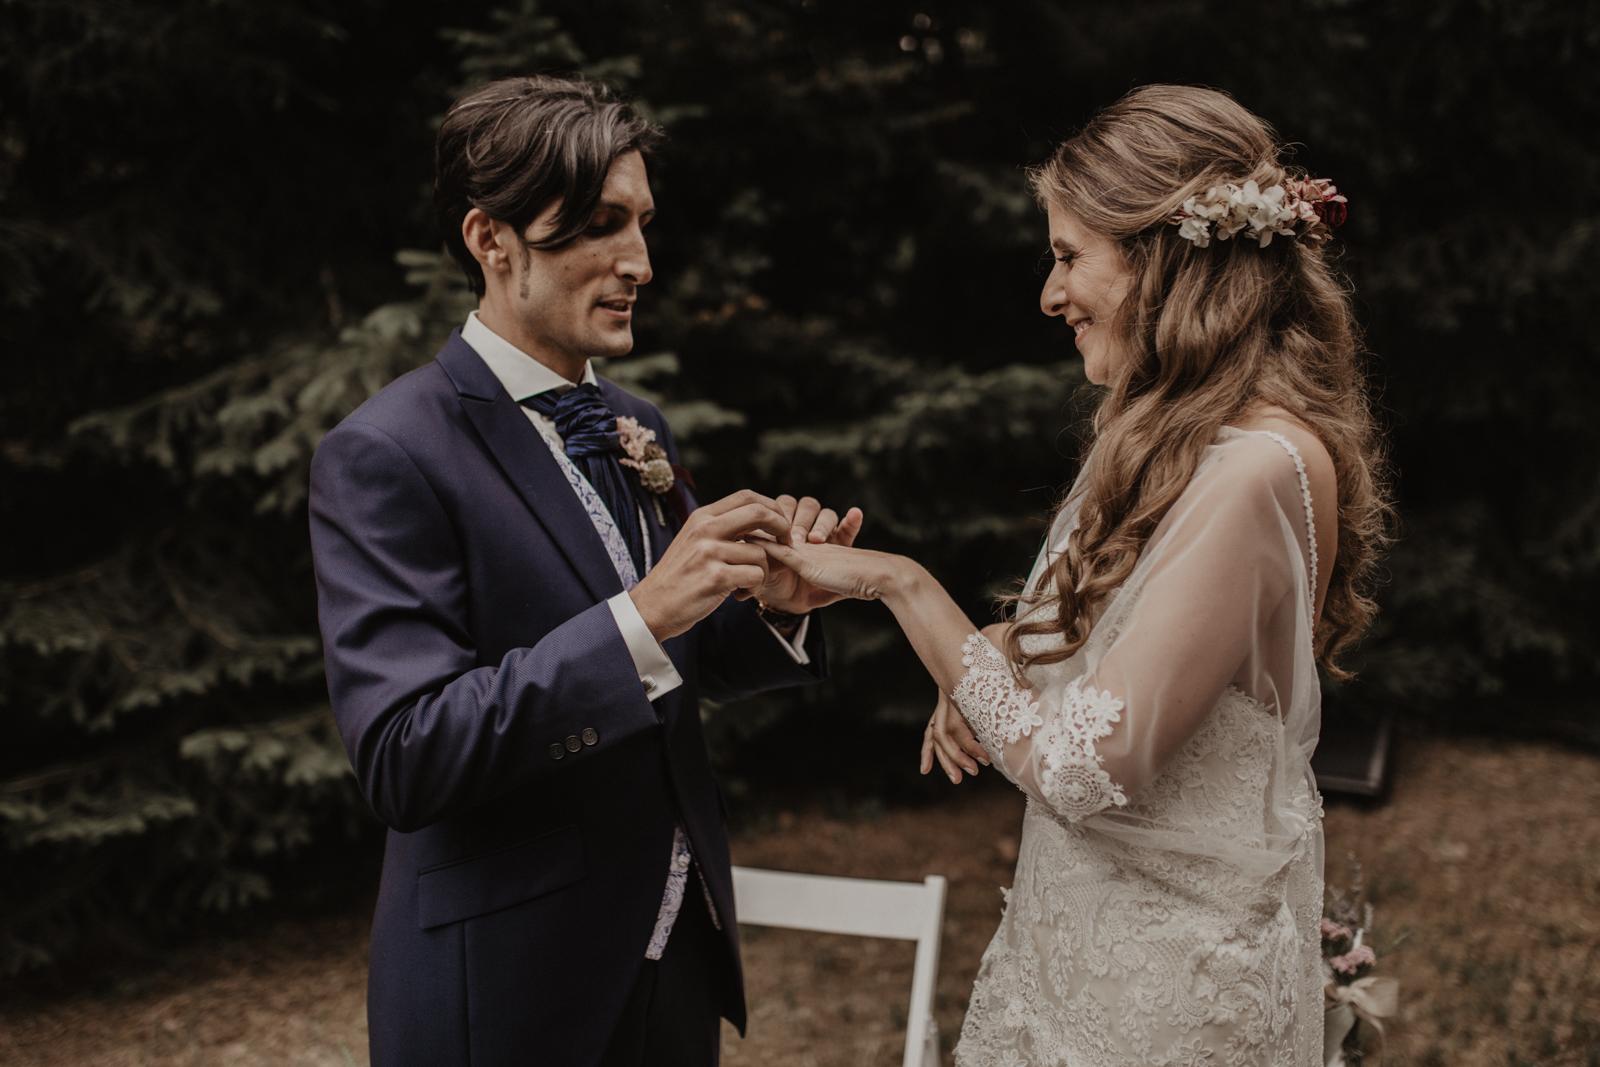 thenortherngirlphotography_photography_thenortherngirl_rebeccascabros_wedding_weddingphotography_weddingphotographer_barcelona_bodaenbarcelona_bodaenmaselmarti_bodarogeryvane-414.jpg